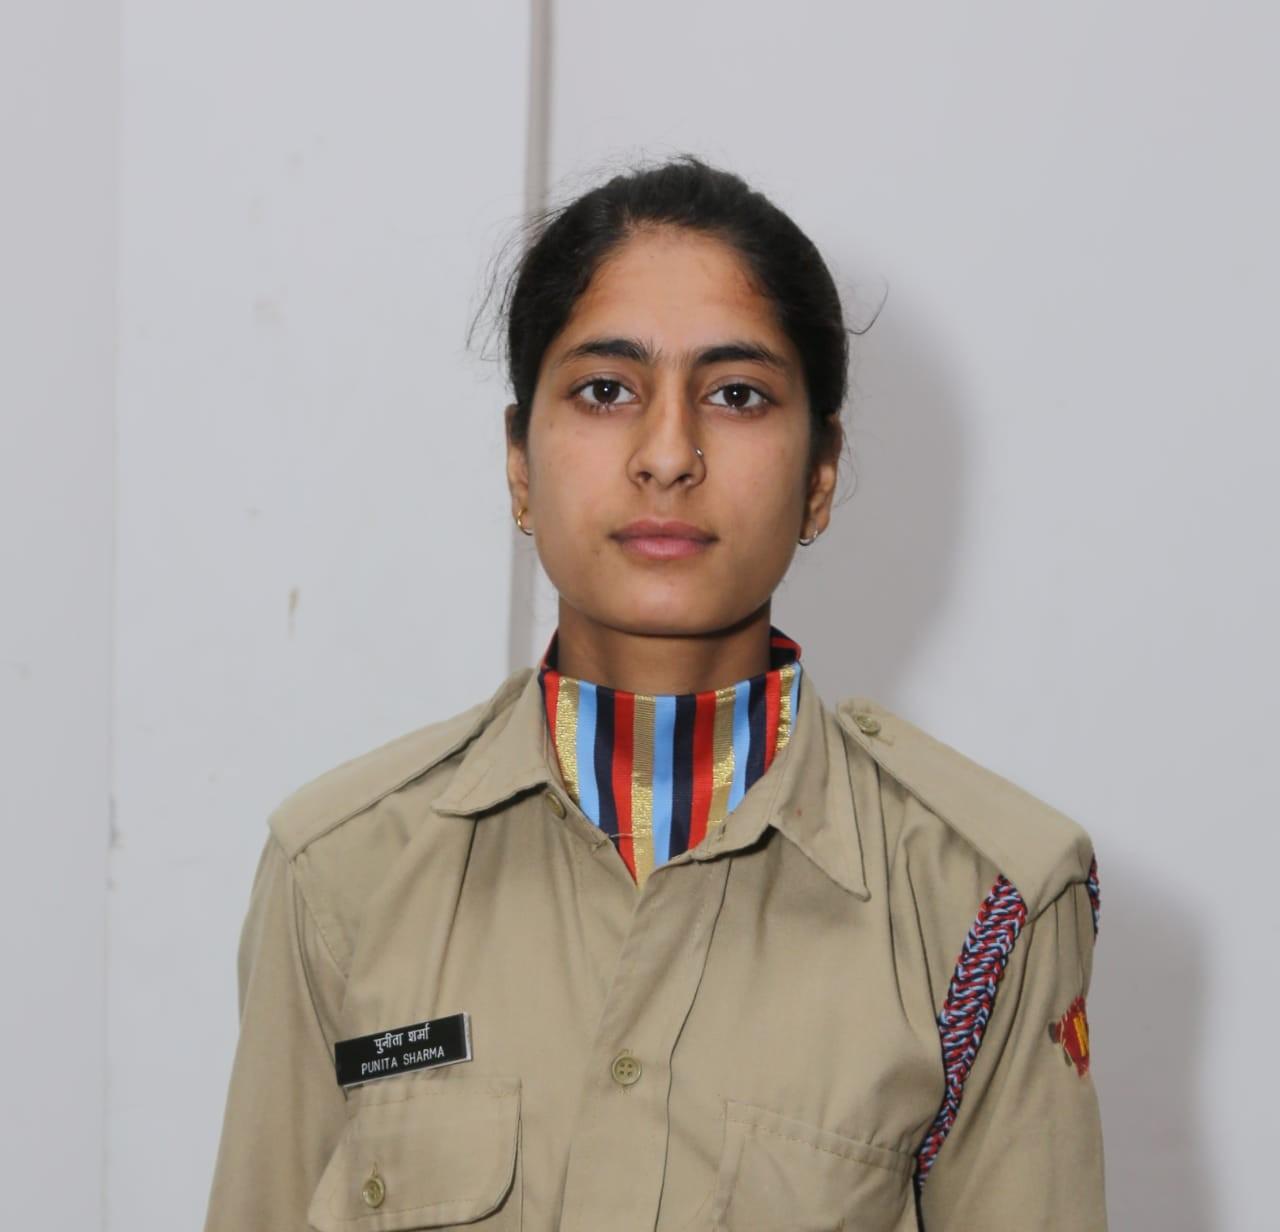 NCC Cadet Punita Sharma represent Punjab, Haryana, Himachal and Chandigarh at Mountaineering Expedition 2019